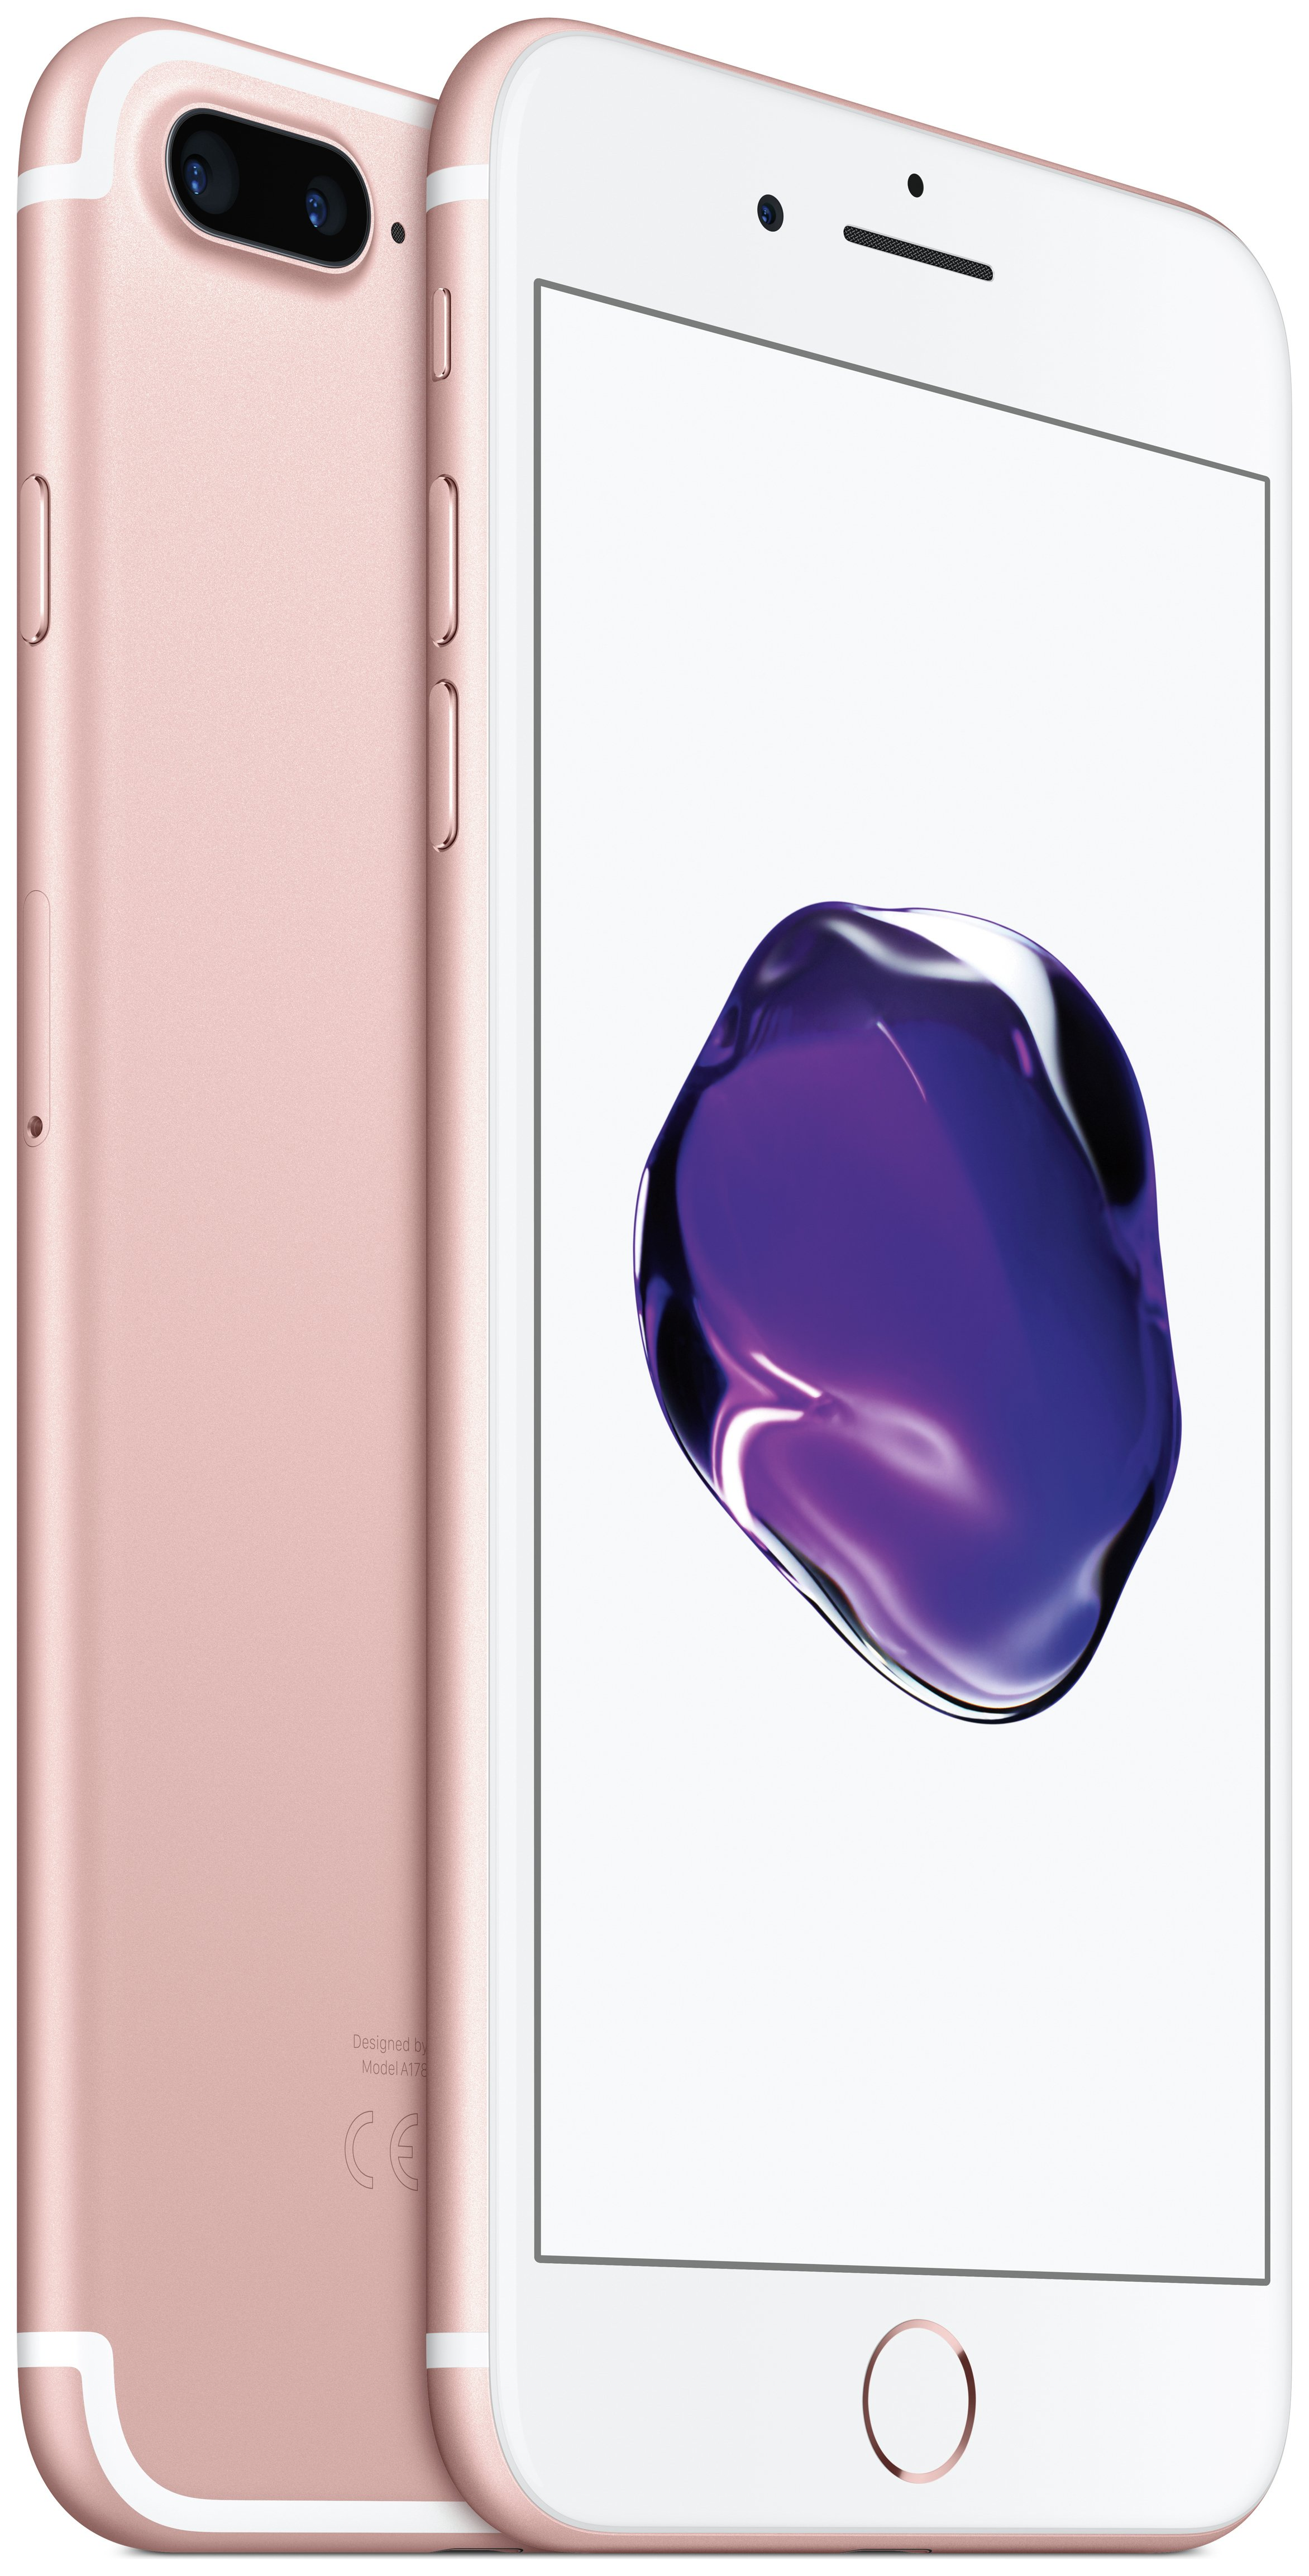 Apple Sim Free Apple iPhone 7 Plus 256GB Mobile Phone - Rose Gold.